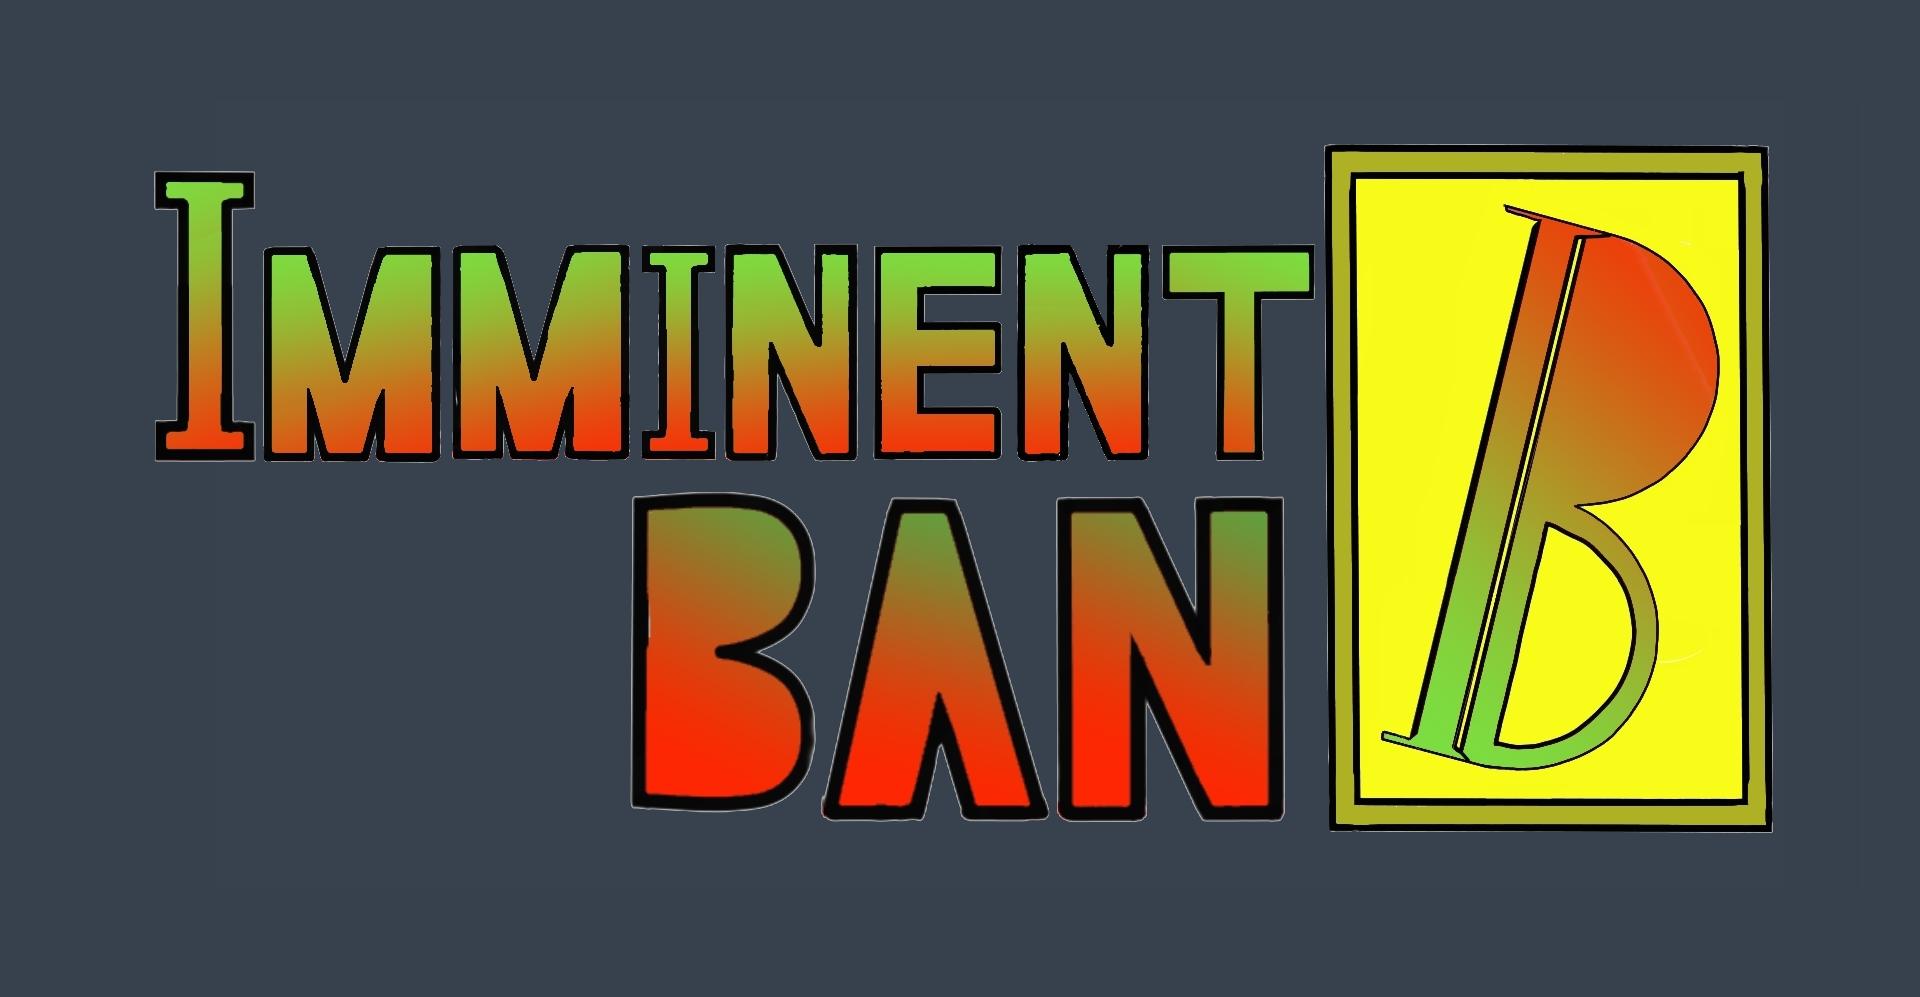 Imminent Ban